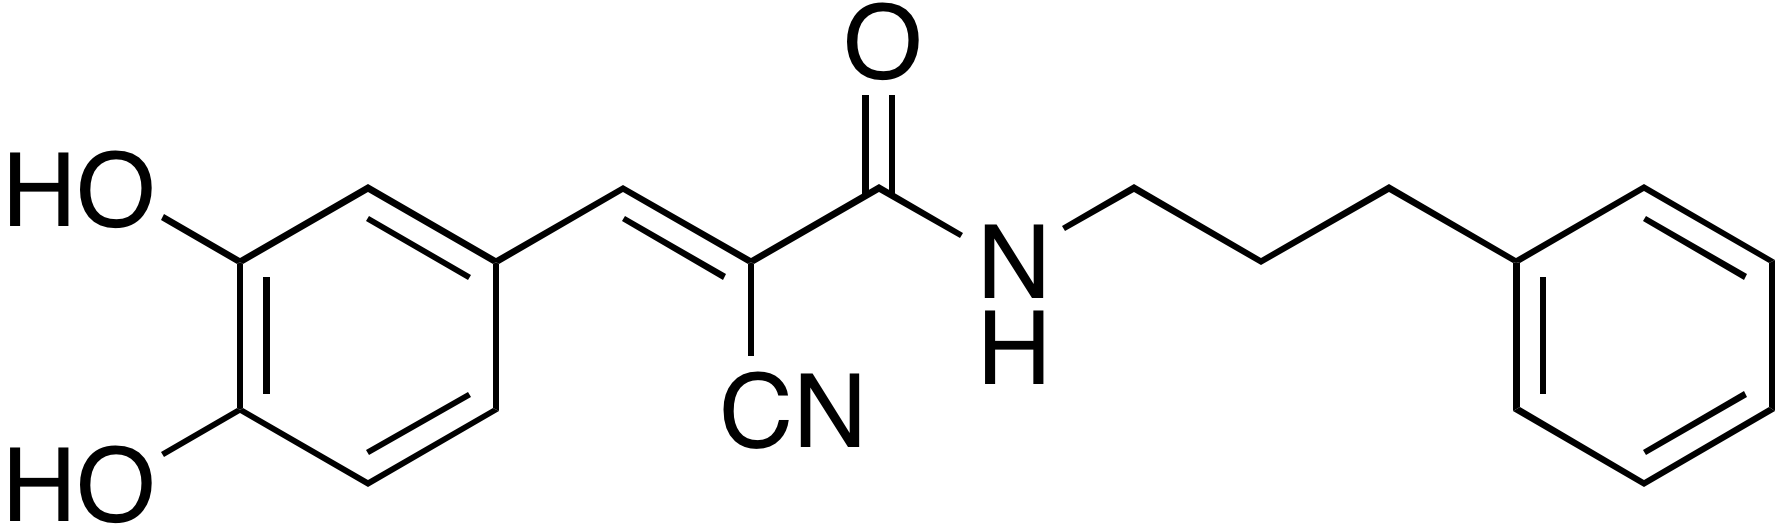 Tyrphostin B46